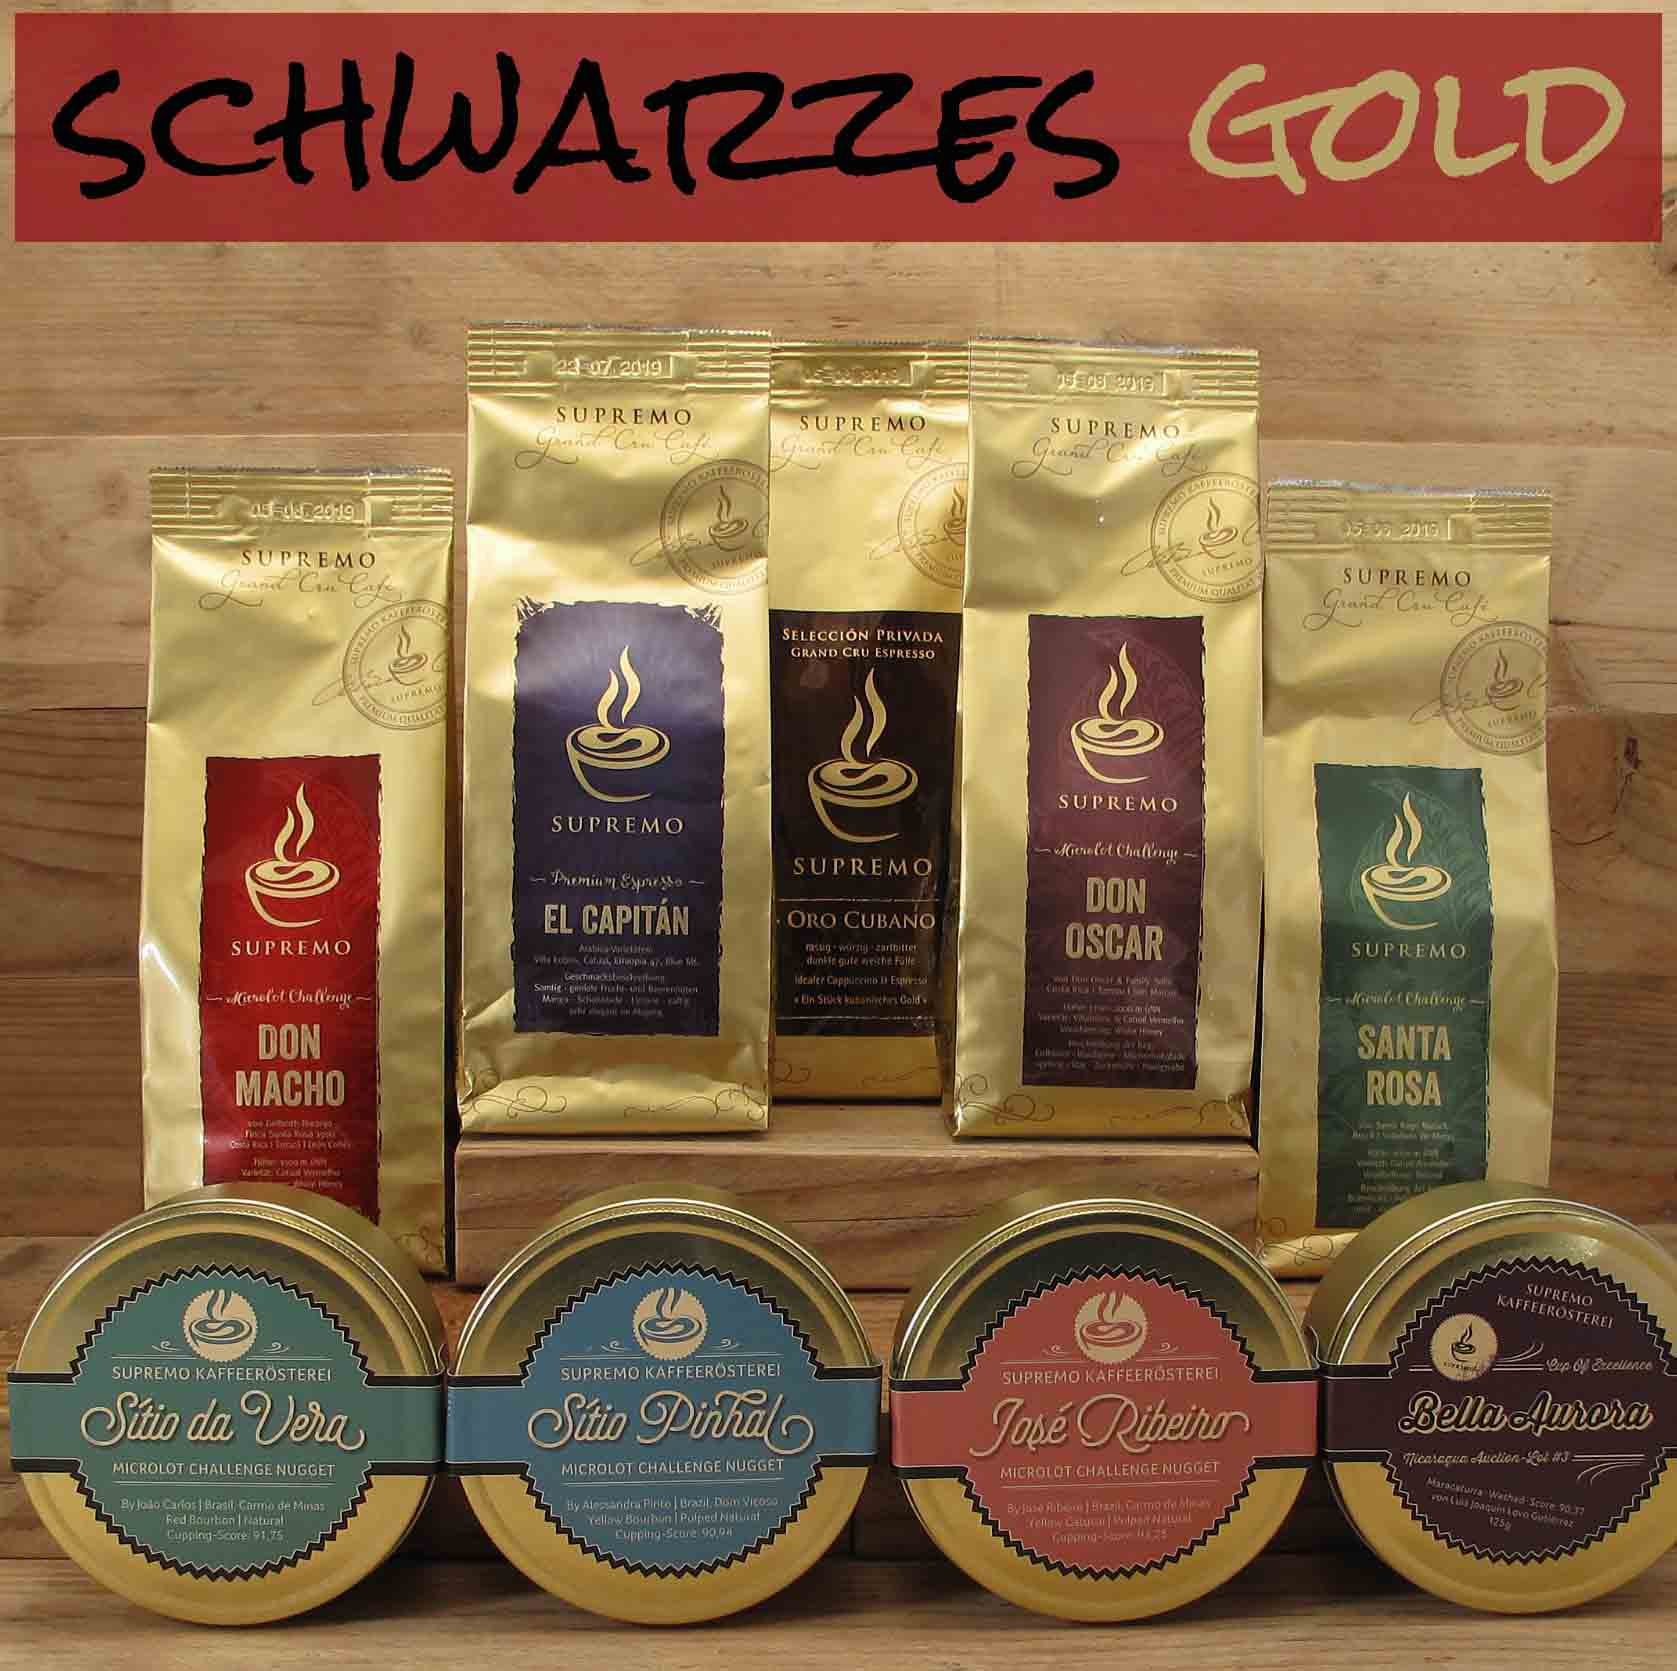 Schwarzes-Gold-R-Kopie